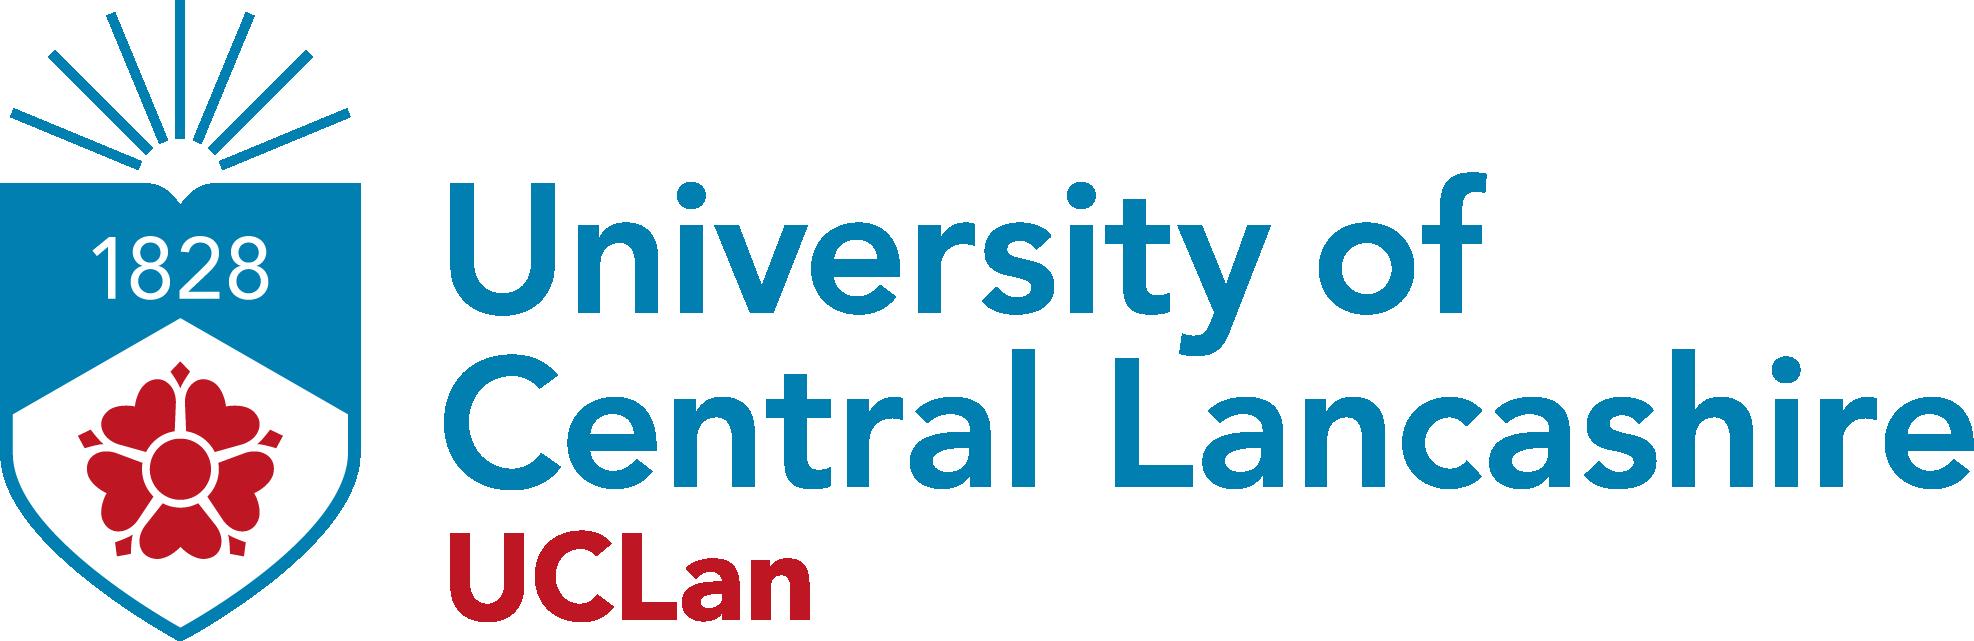 University of Central Lancashire (UCLan) Head of Development & Alumni